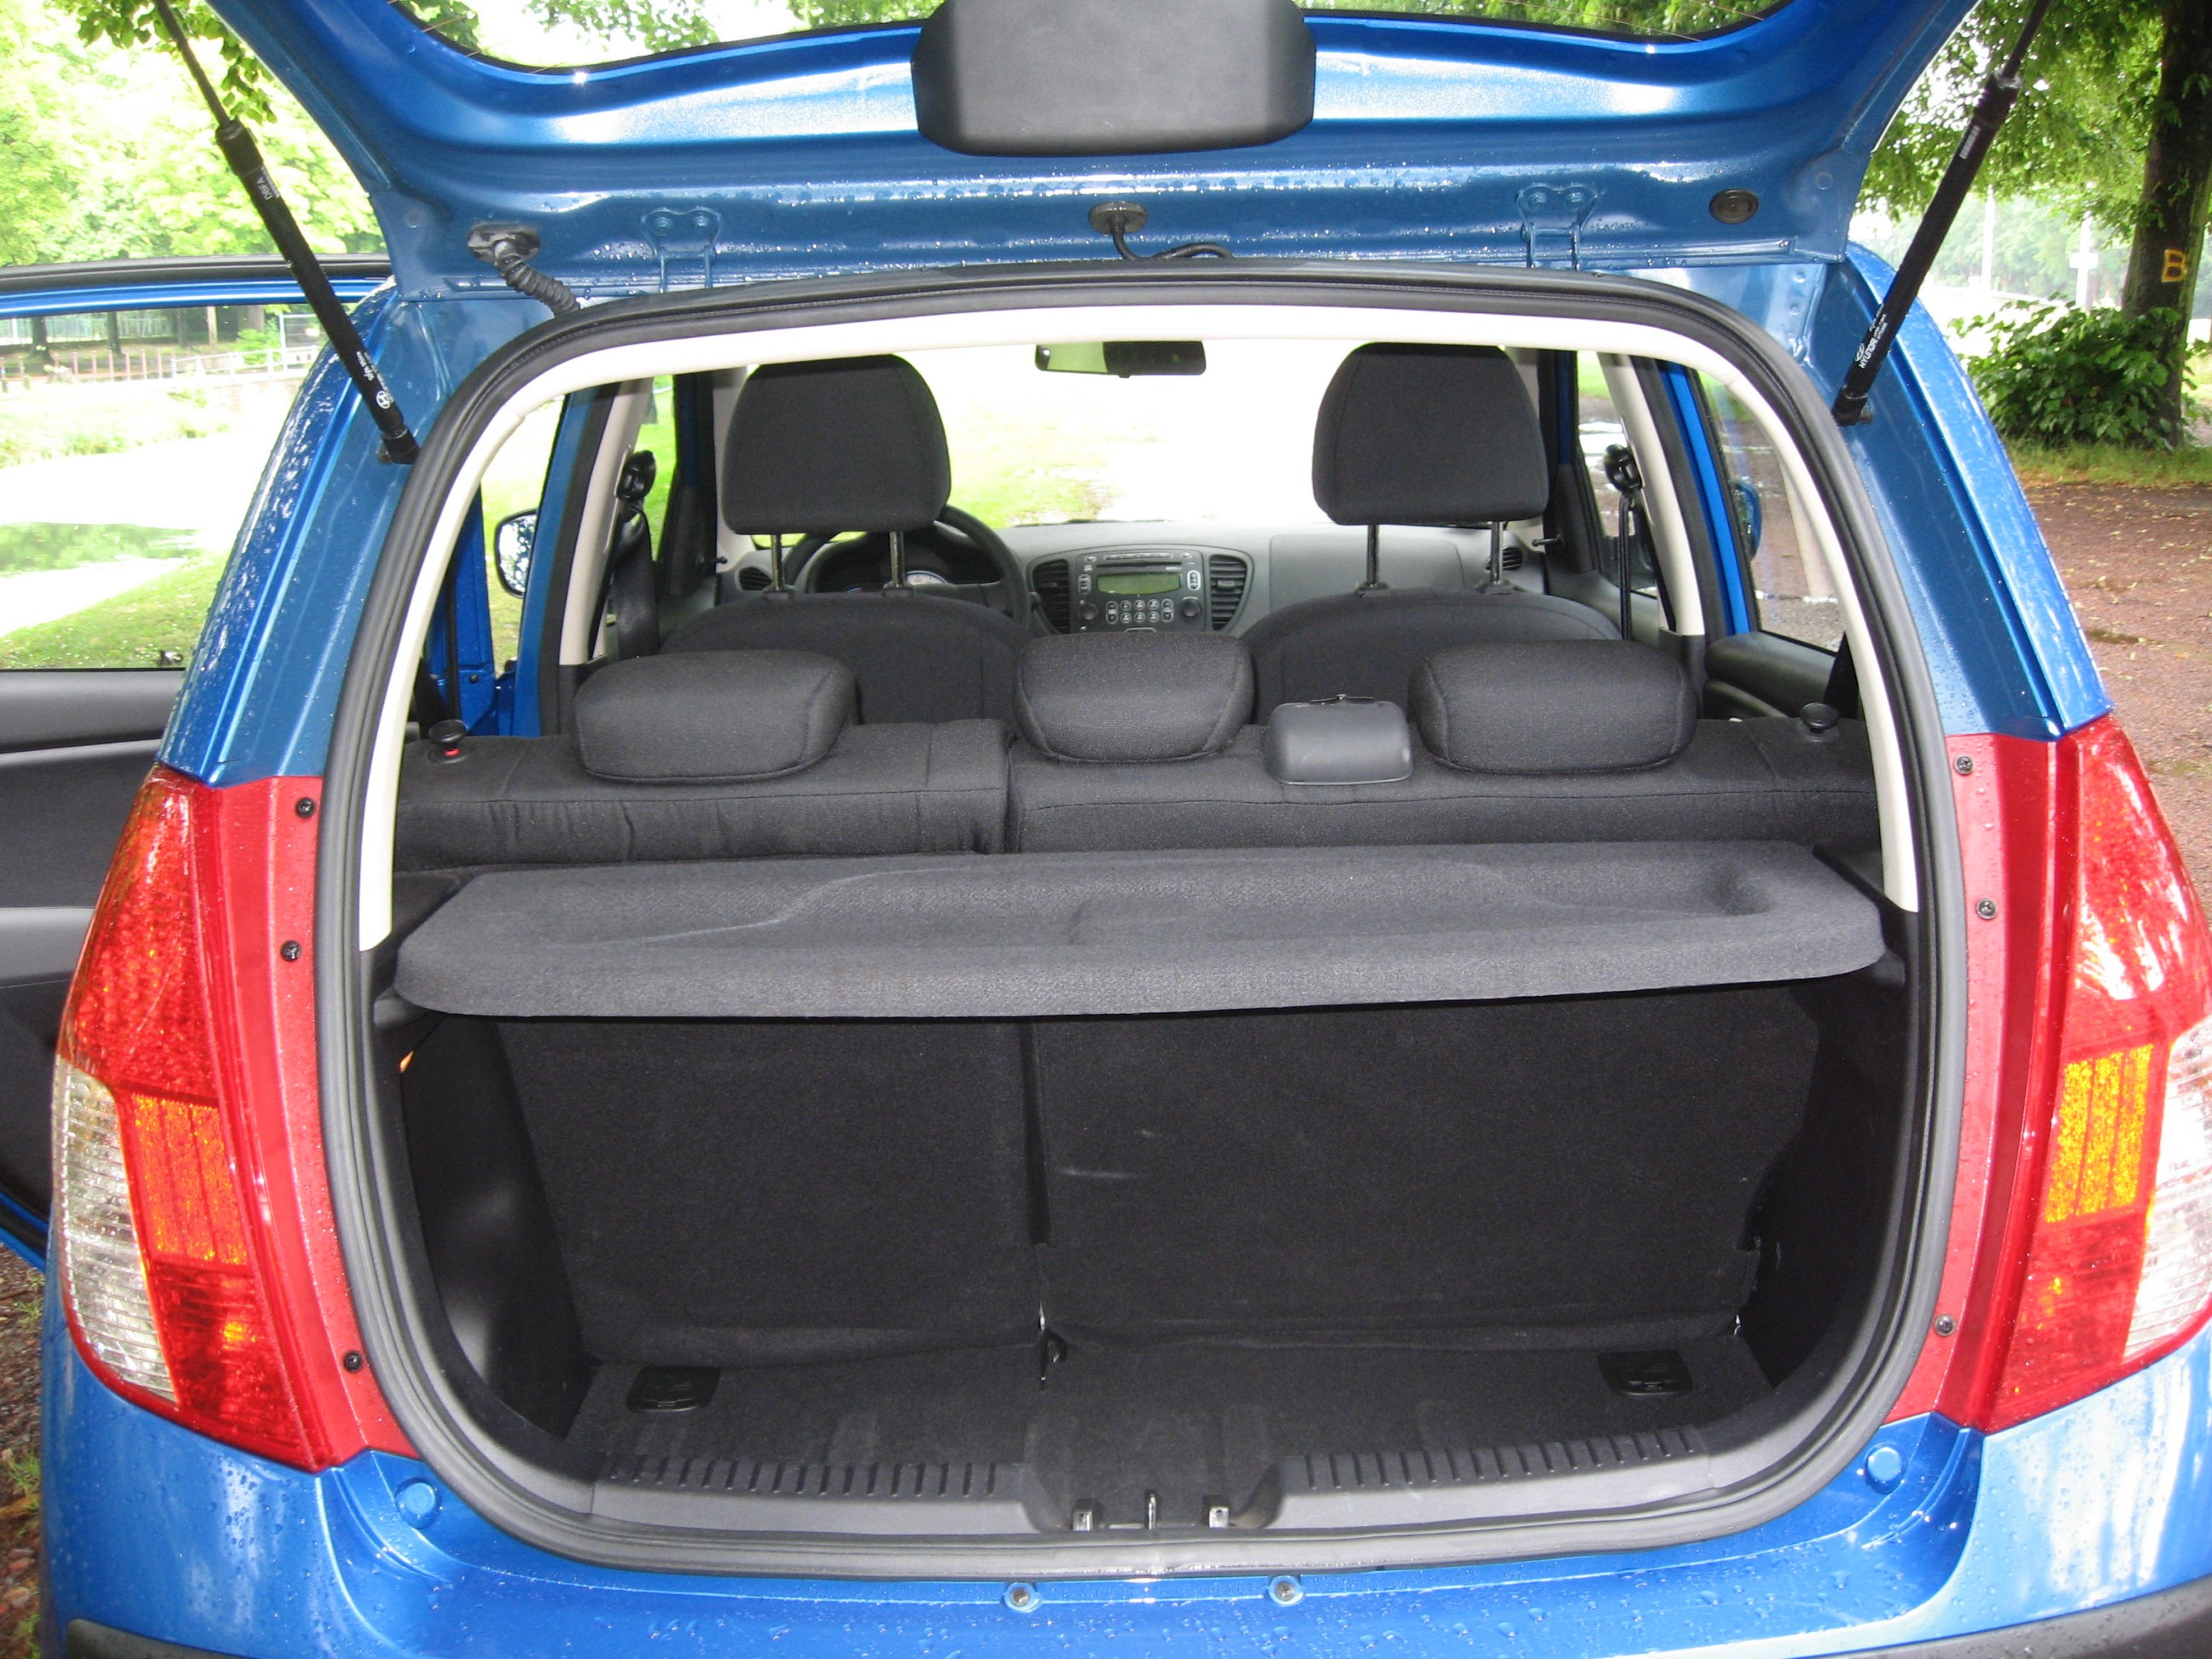 test drive rpt hyundai i10 1 1 66ch pack confort auto titre. Black Bedroom Furniture Sets. Home Design Ideas